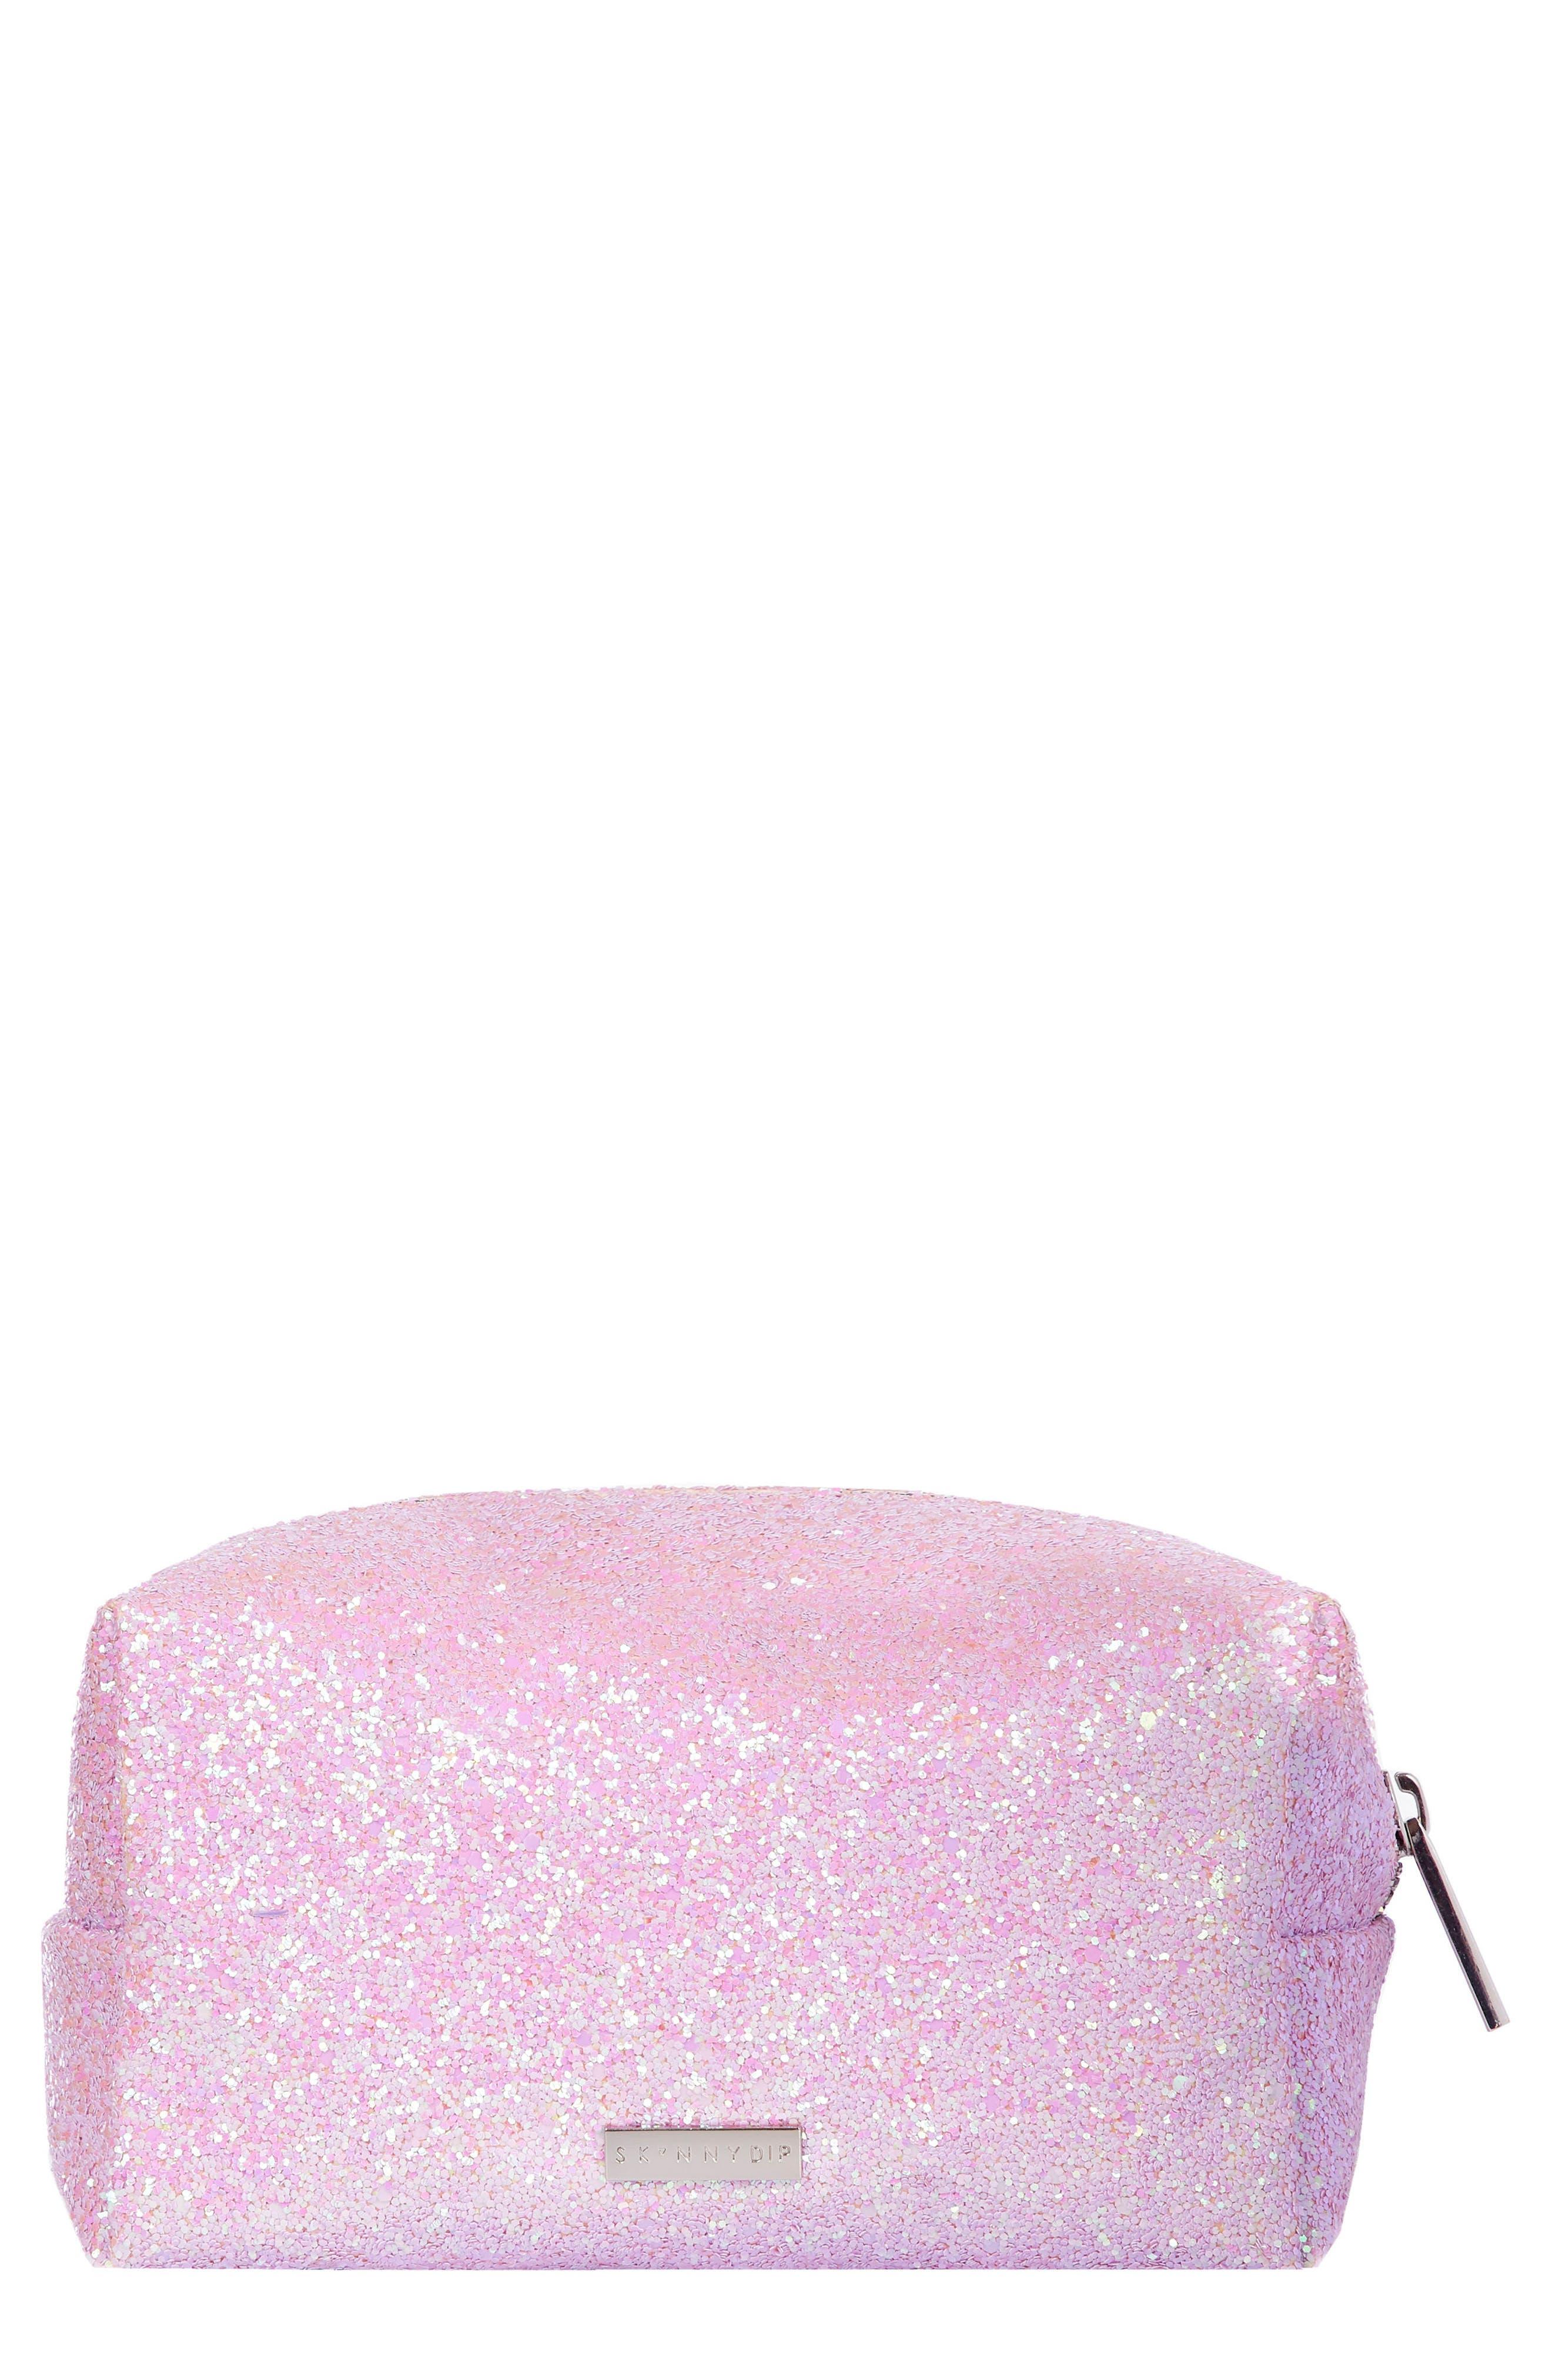 Skinny Dip Pink Glitsy Cosmetics Case,                         Main,                         color, No Color